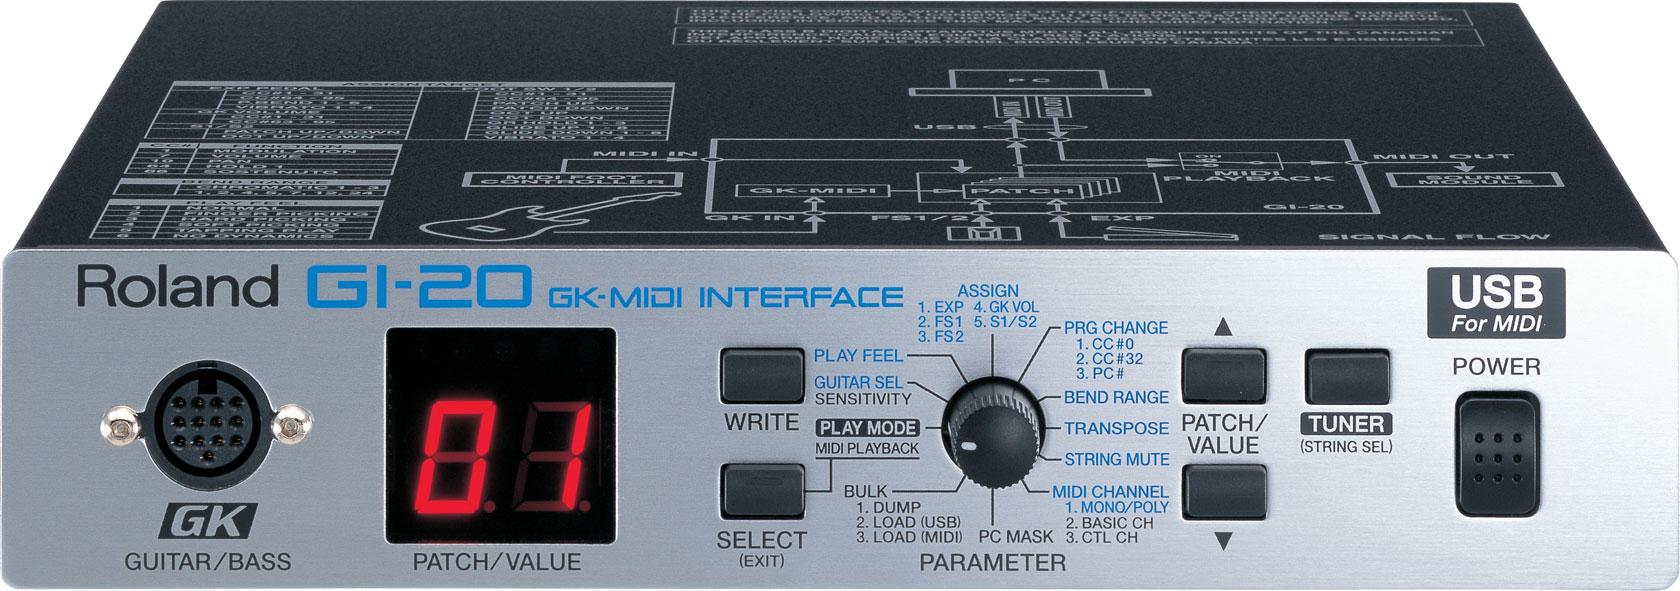 GI-20 | GK-MIDI Interface - Roland